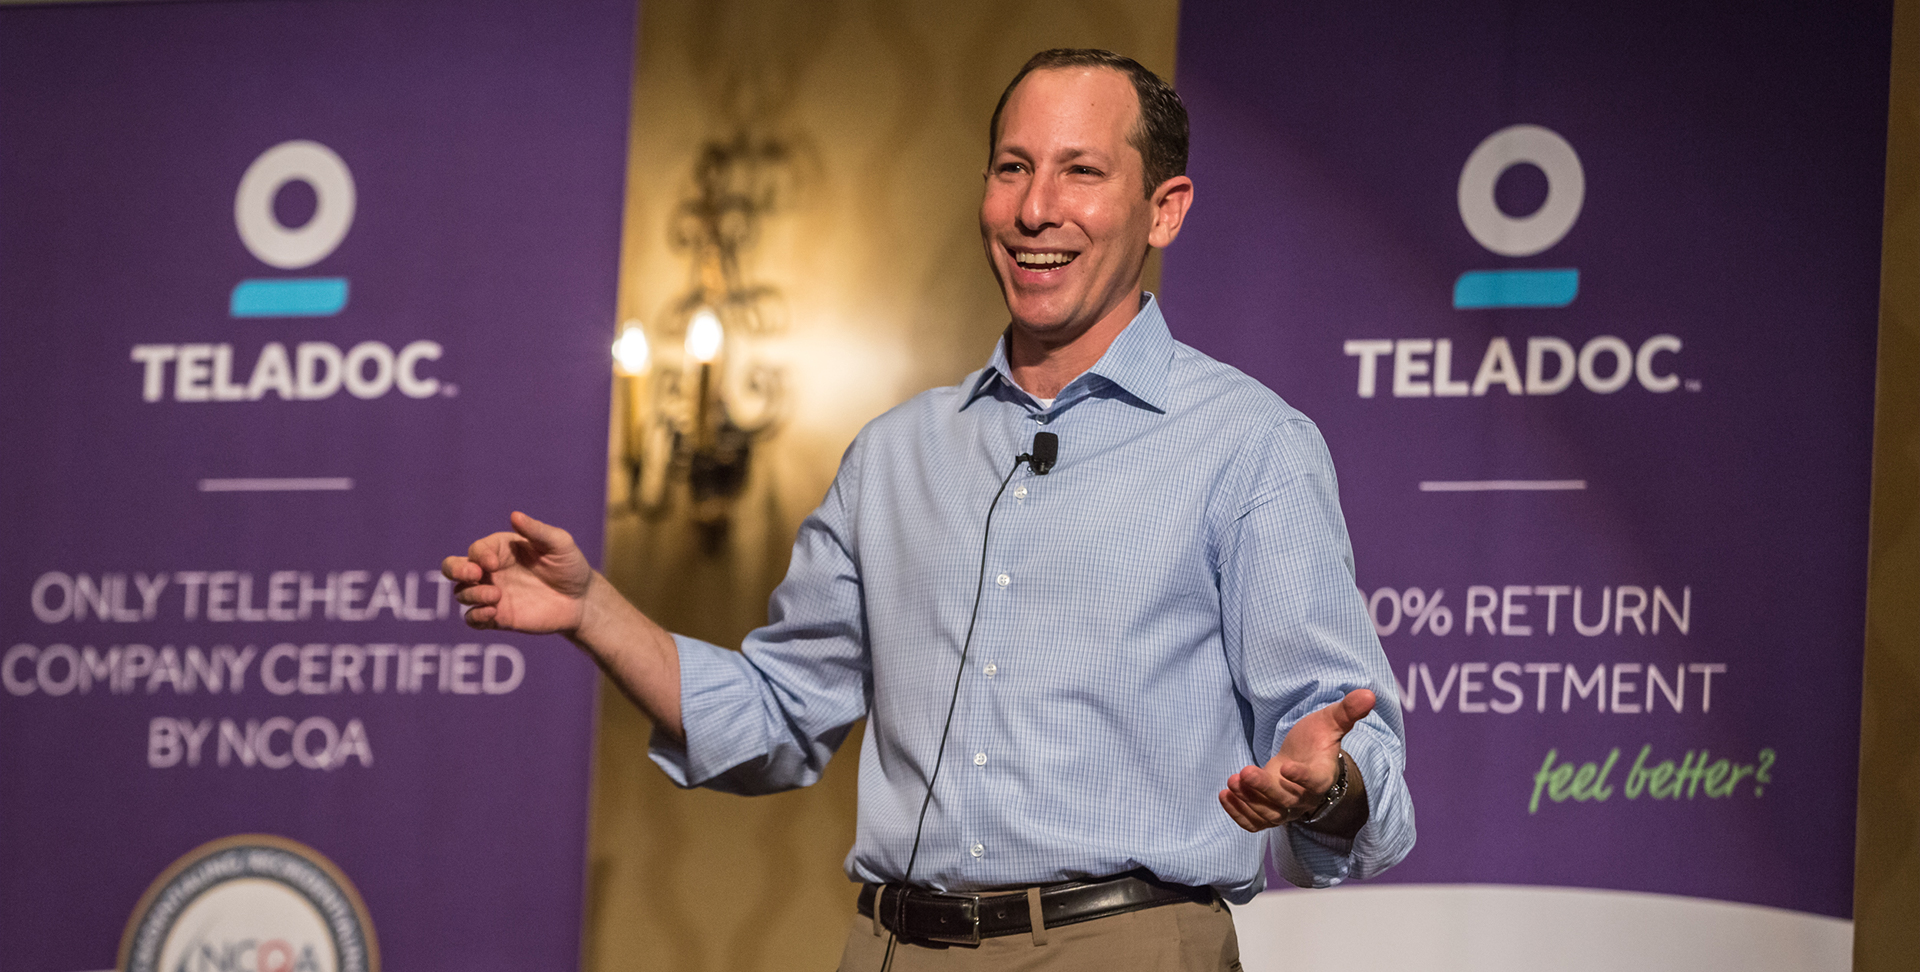 Jason Gorevic, Teladoc CEO